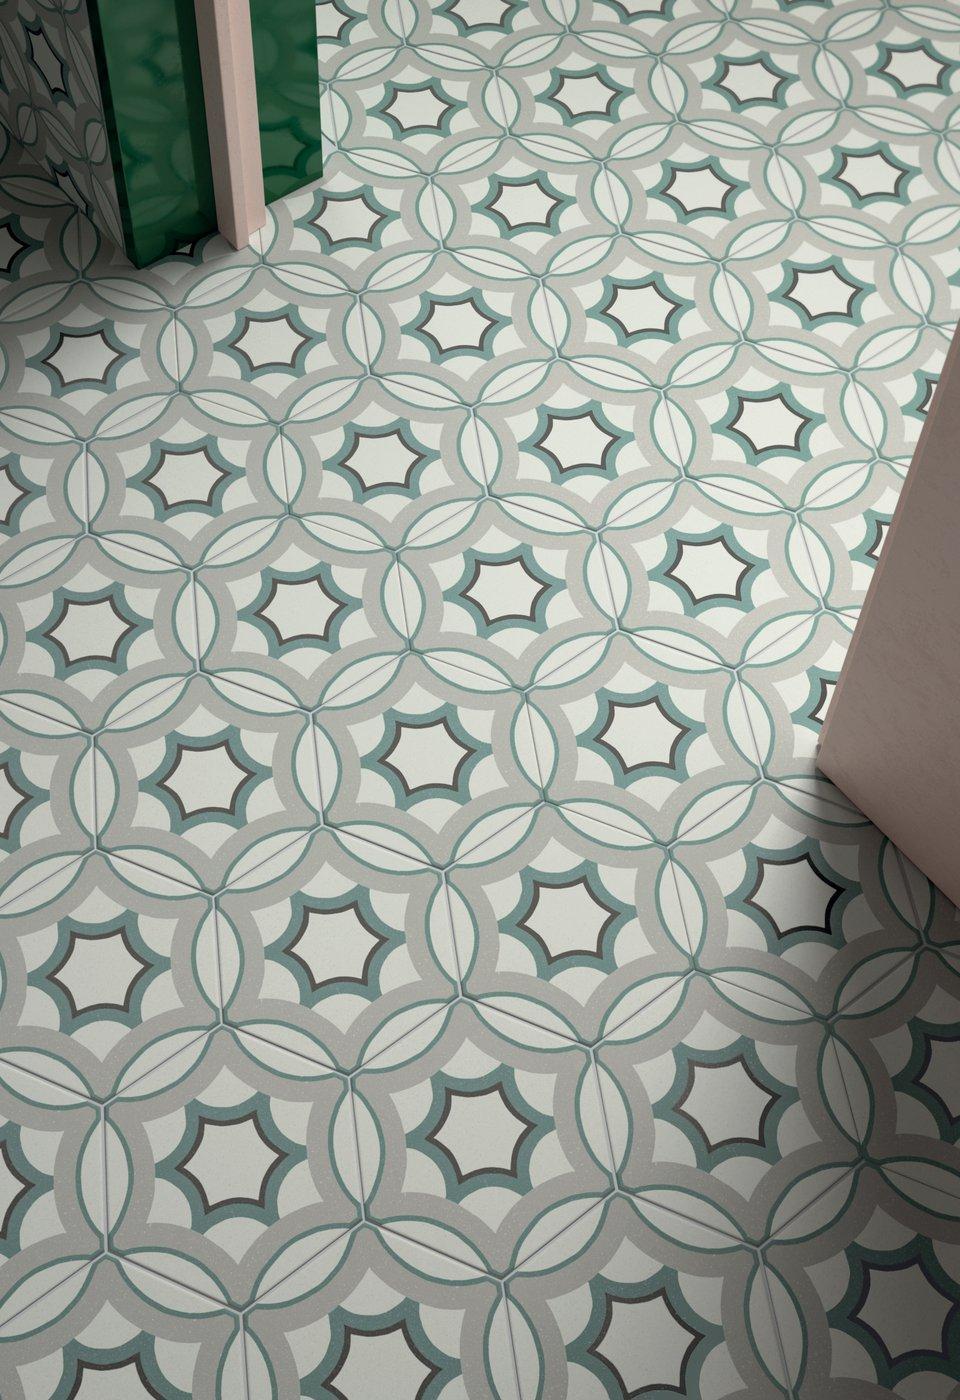 Zelená v kúpeľni - Obrázok č. 24